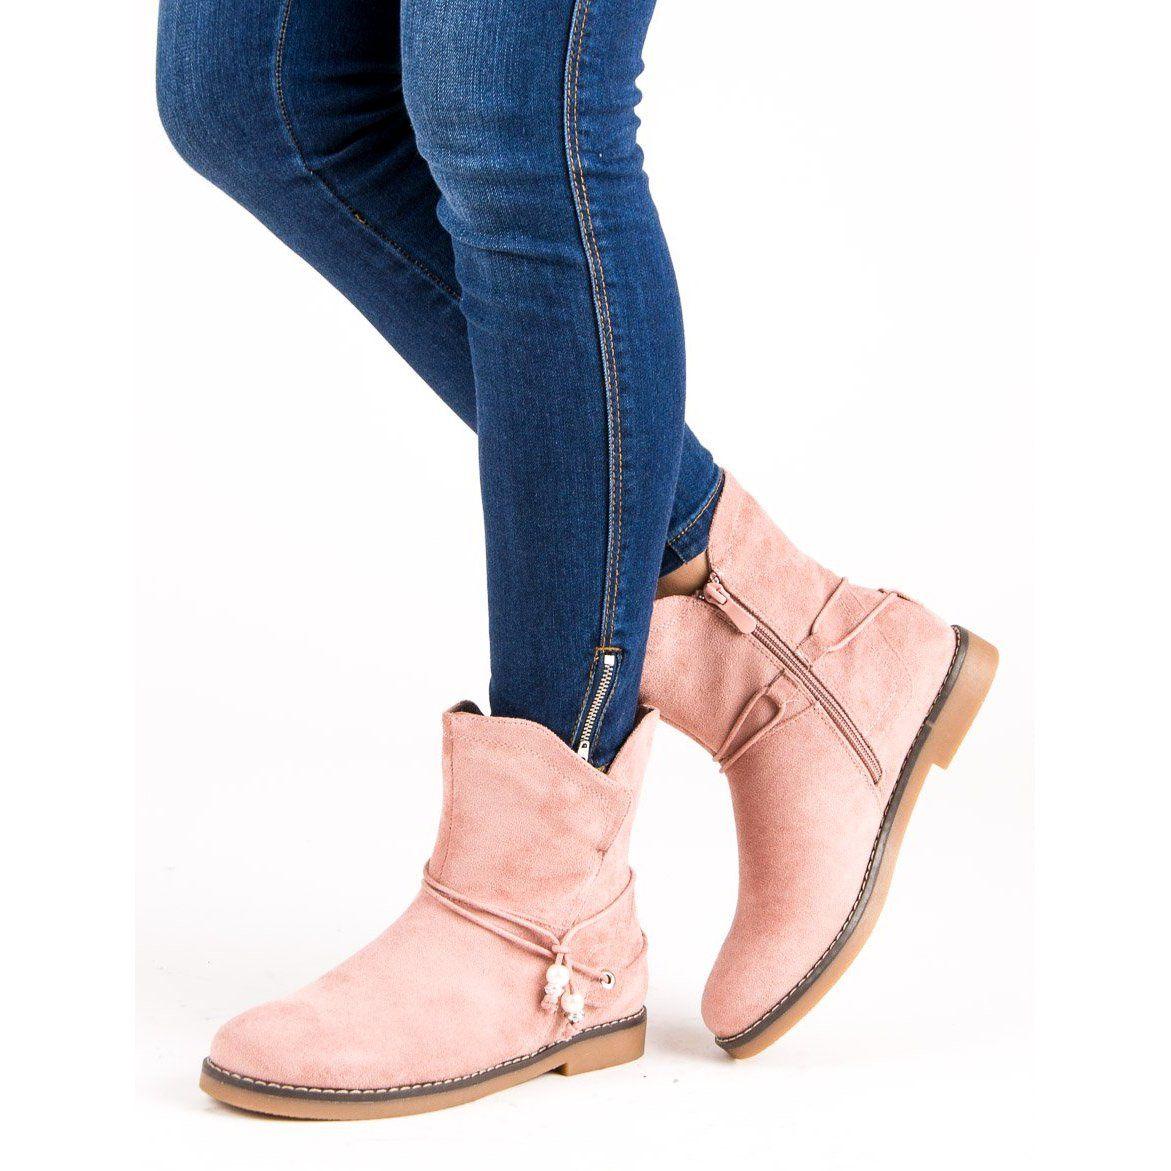 Wygodne Jesienne Botki Rozowe Chelsea Boots Shoes Boots